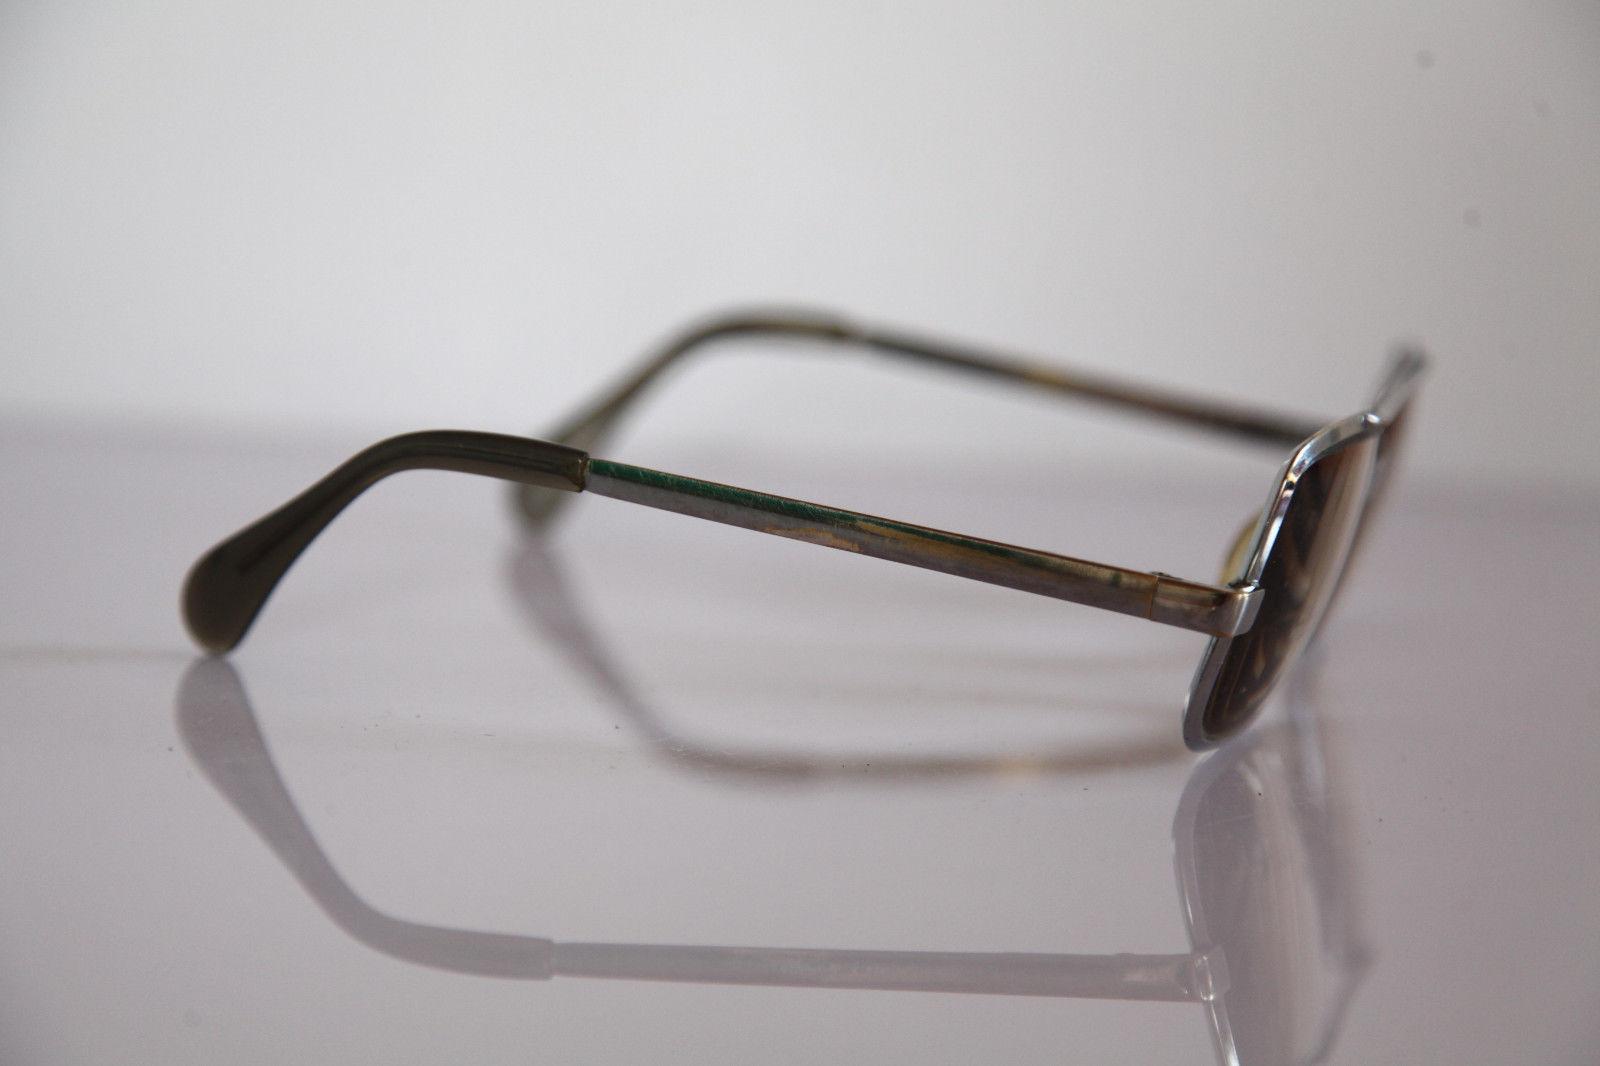 MENRAD M 305 Eyewear, Chrome Frame,  RX-Able Crystal Prescription lens.